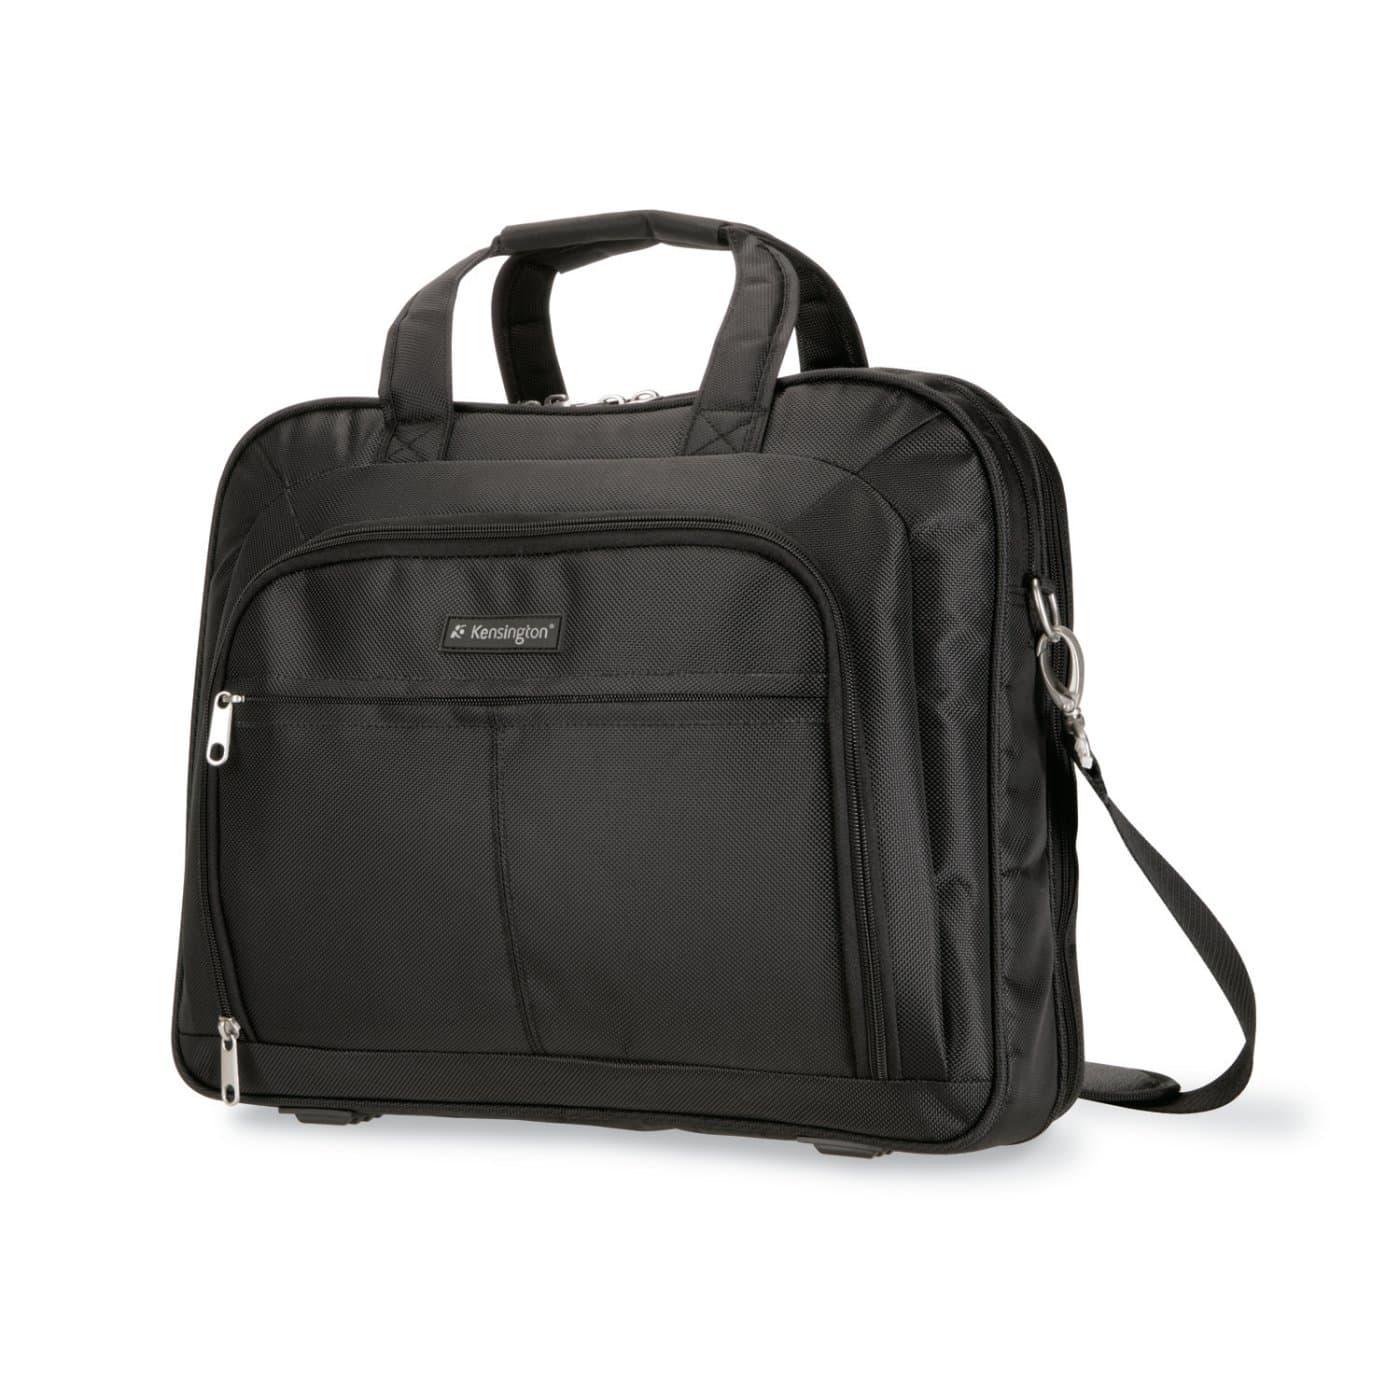 3cd924b01f9 Kensington - Producten - Laptoptassen - Briefcases / Messengers ...